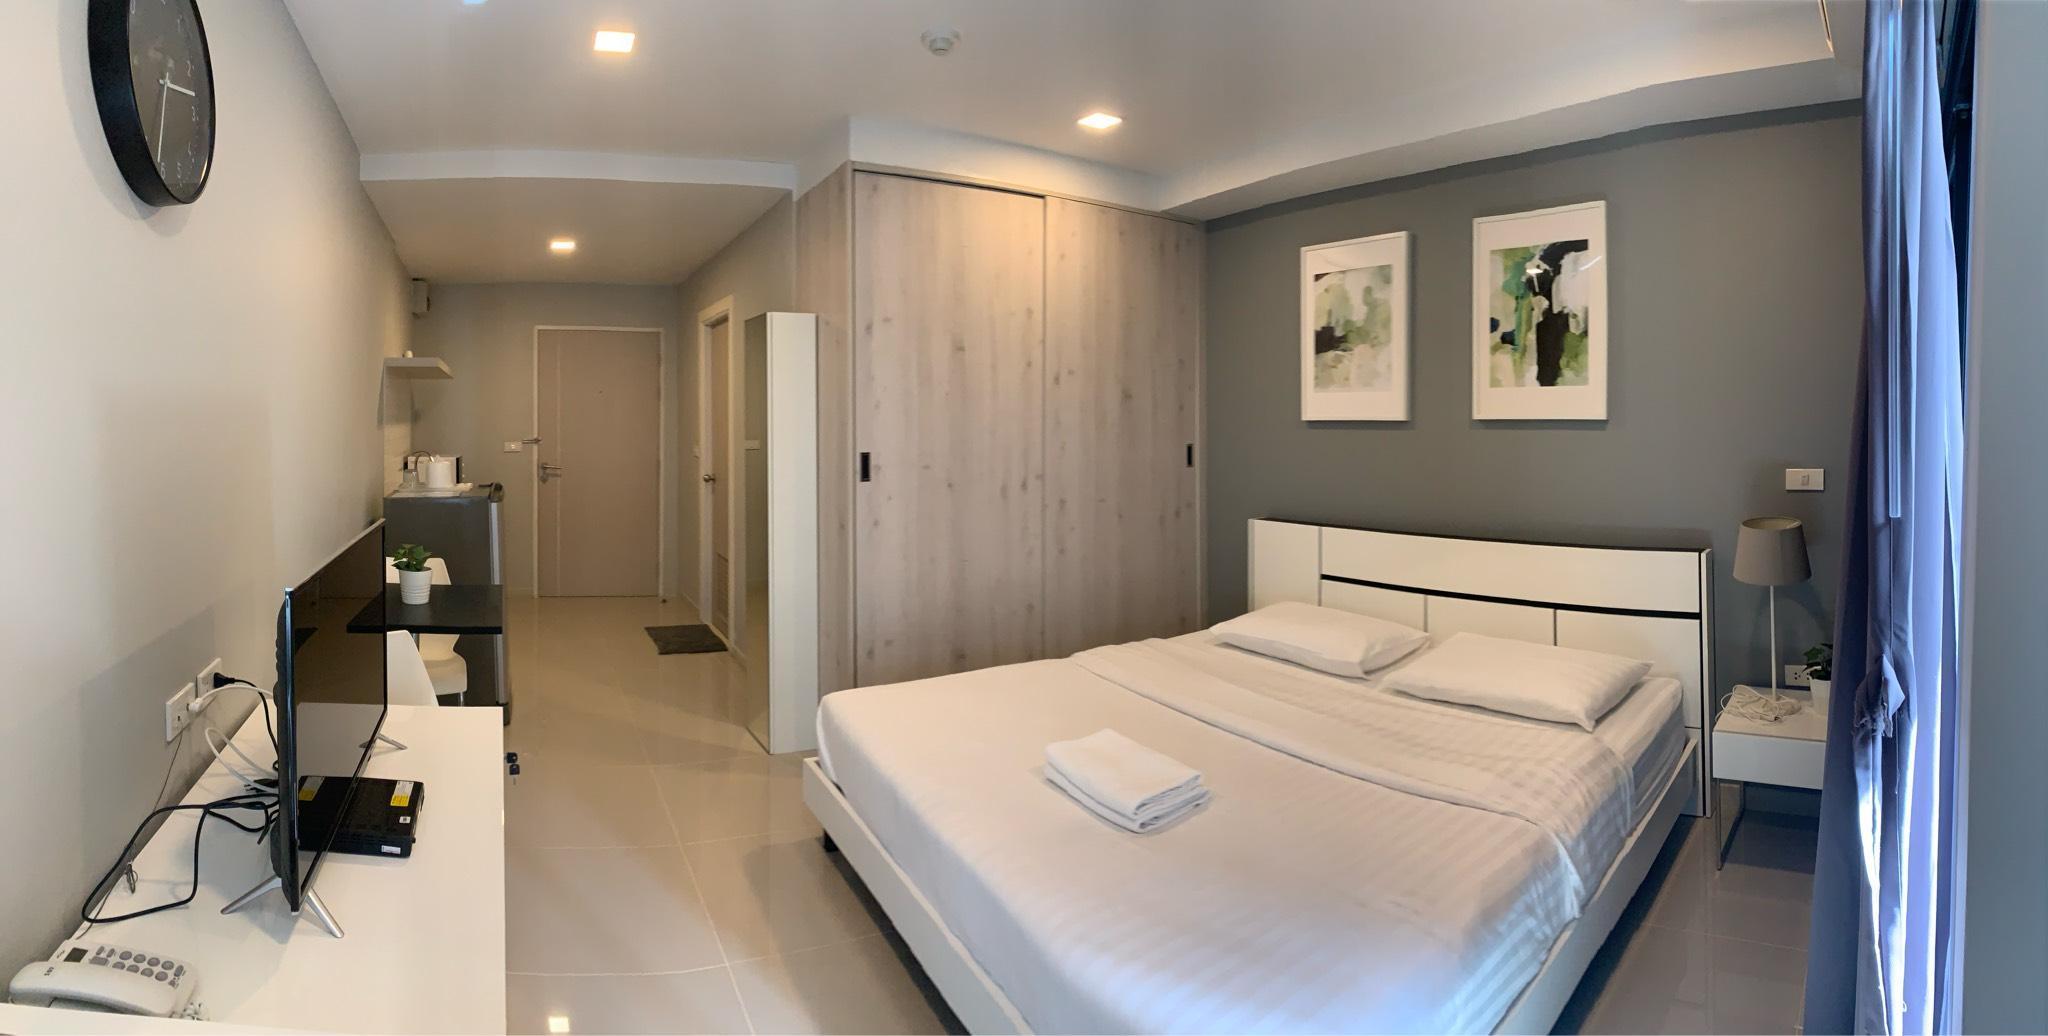 LKN GRAND Room 304